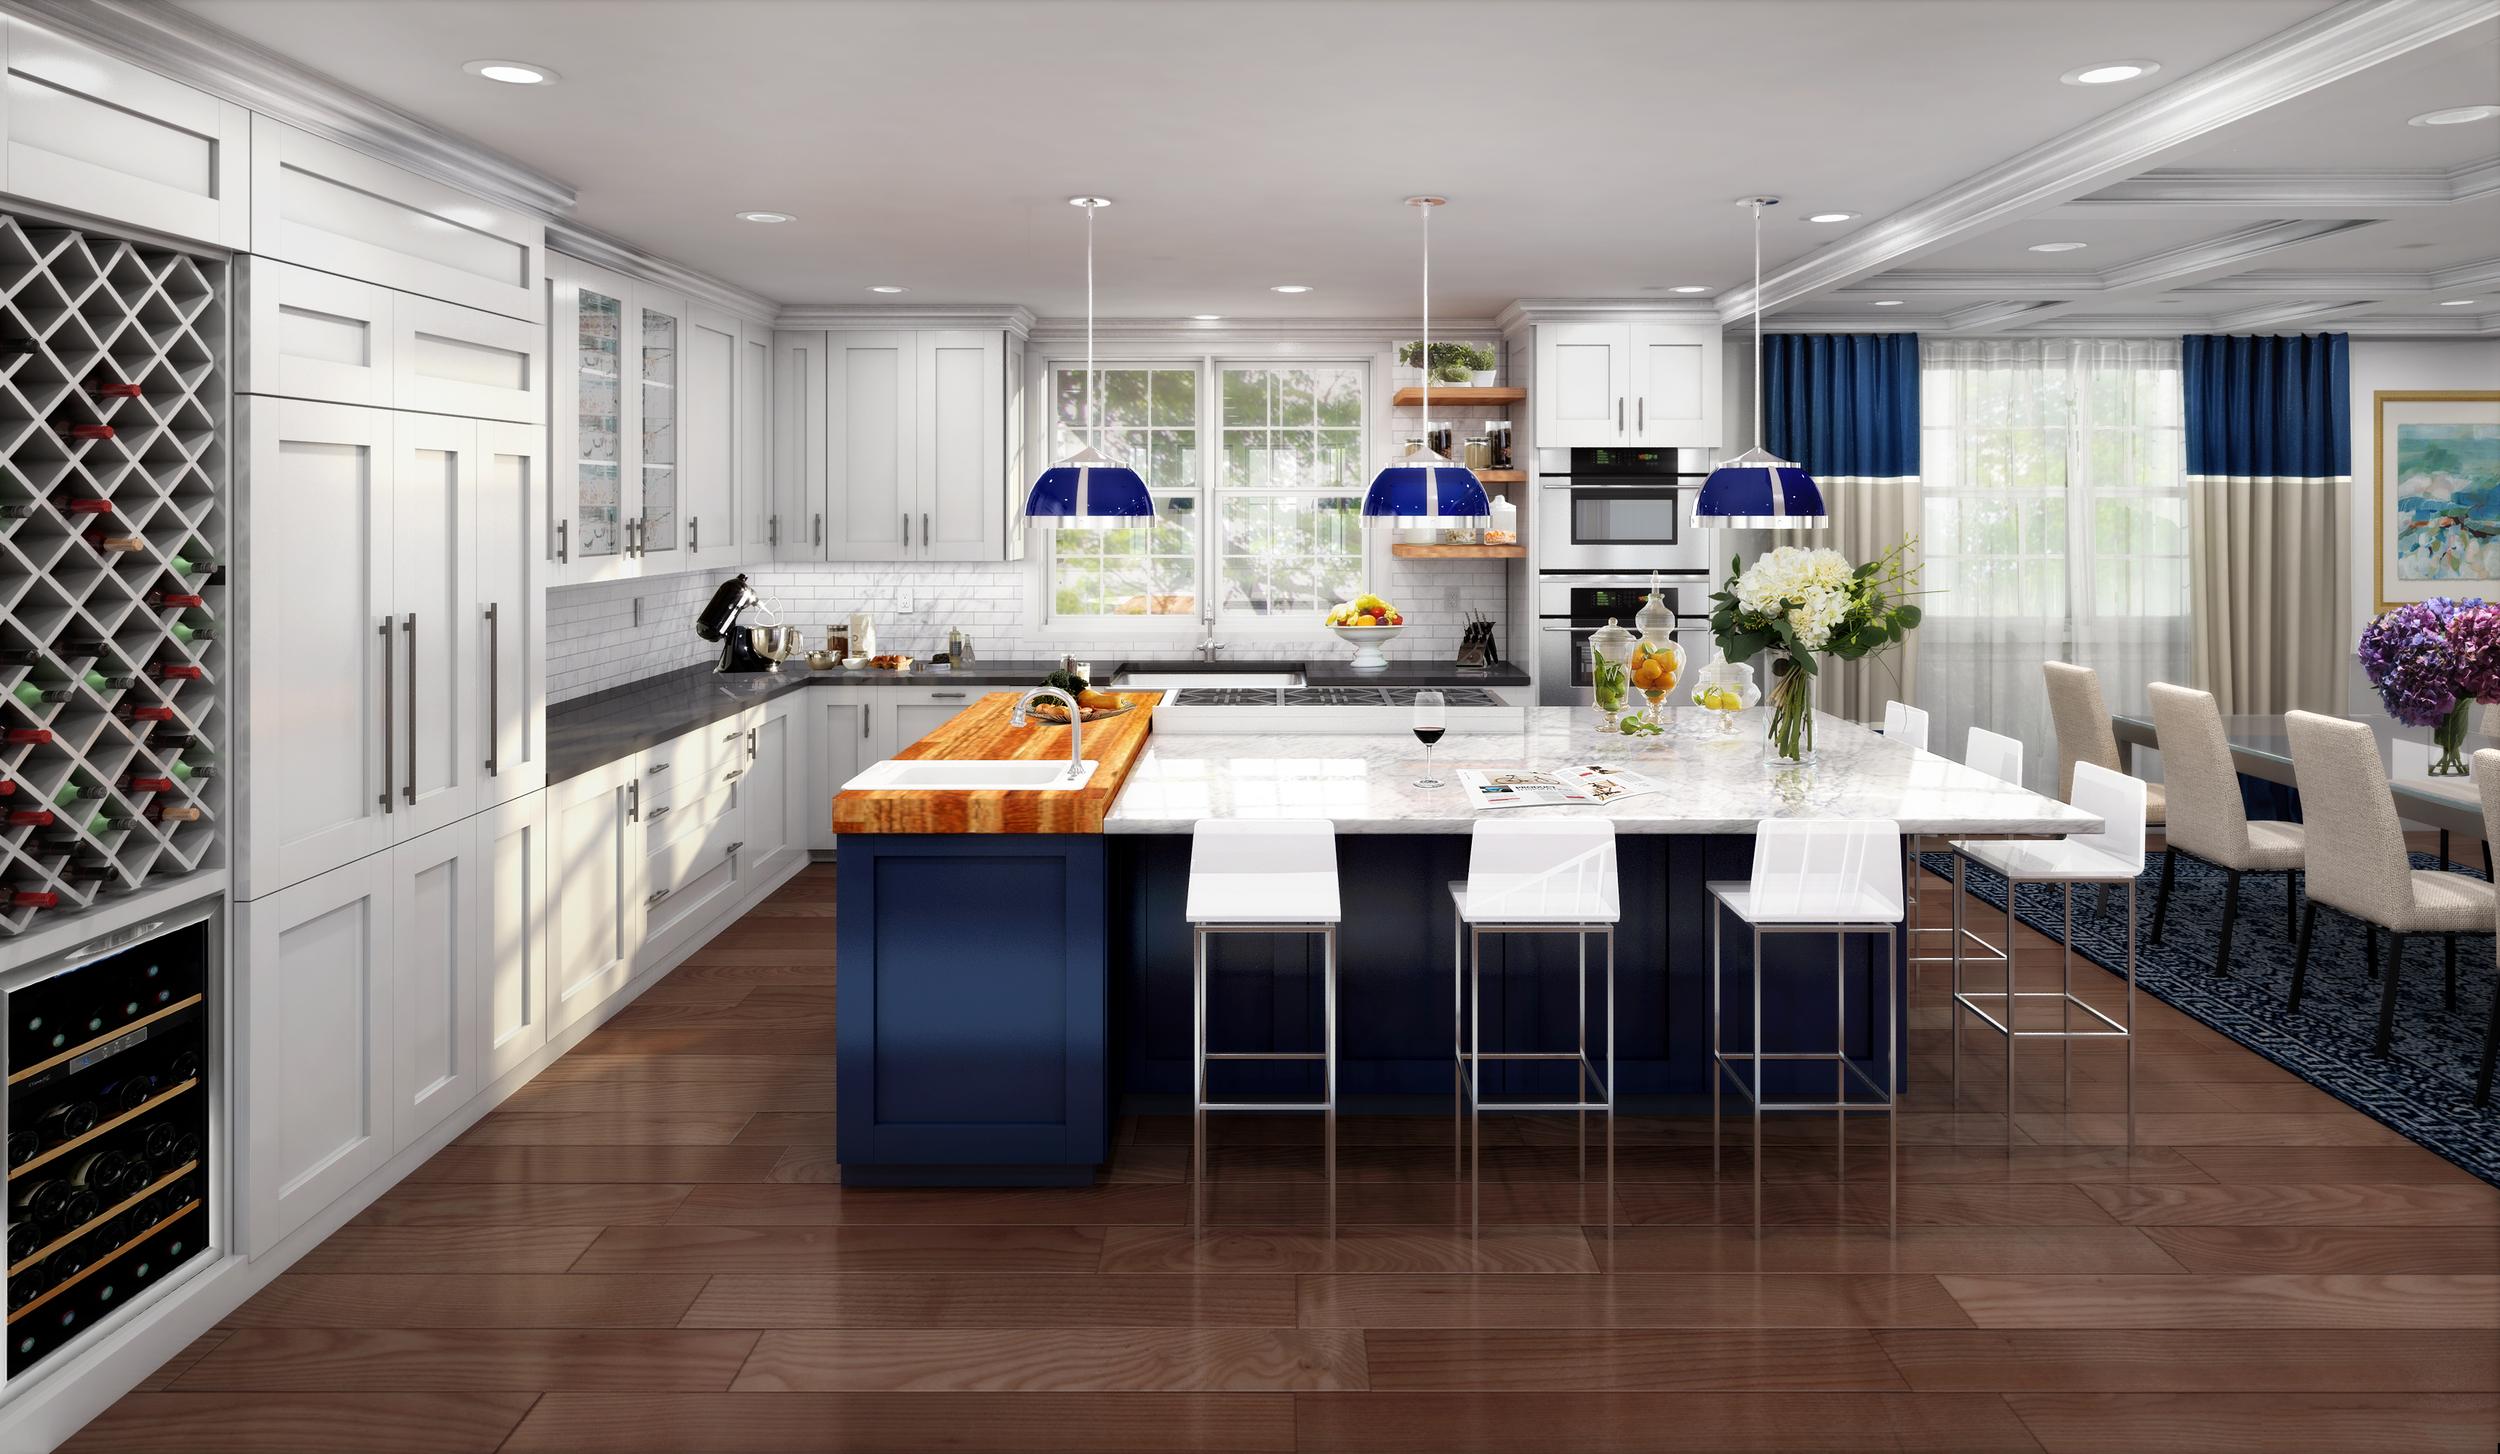 2PierceLane_kitchenFinal.jpg